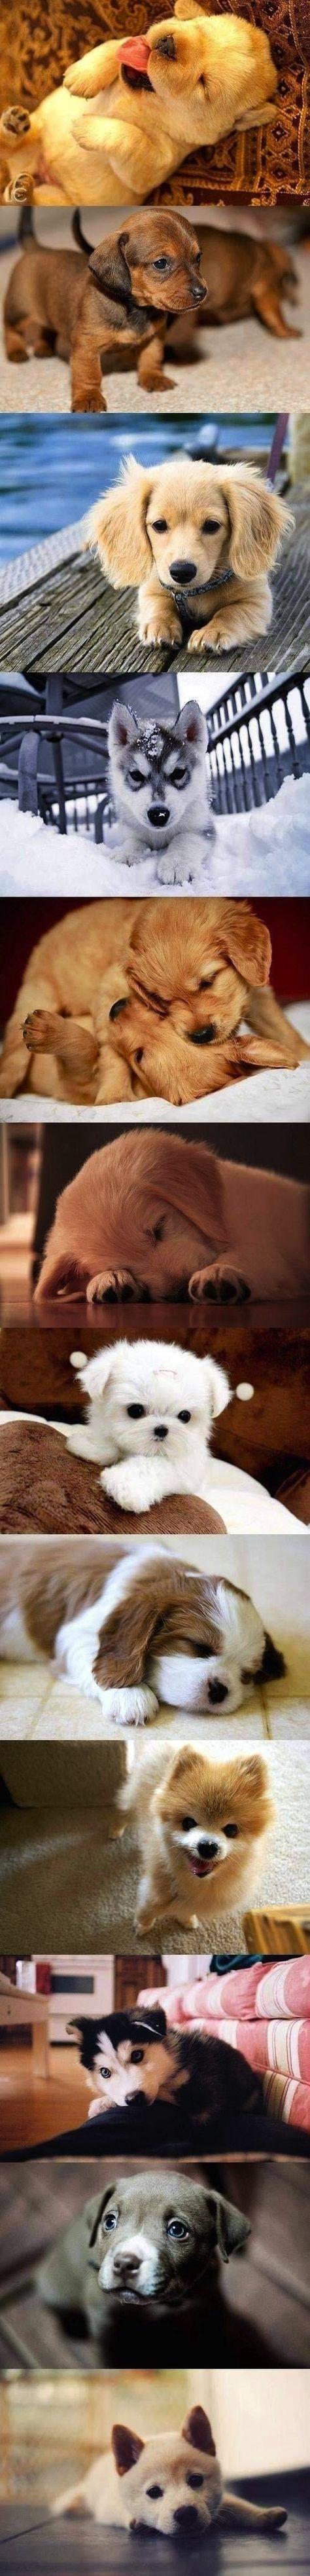 Puppies. Adorable :)